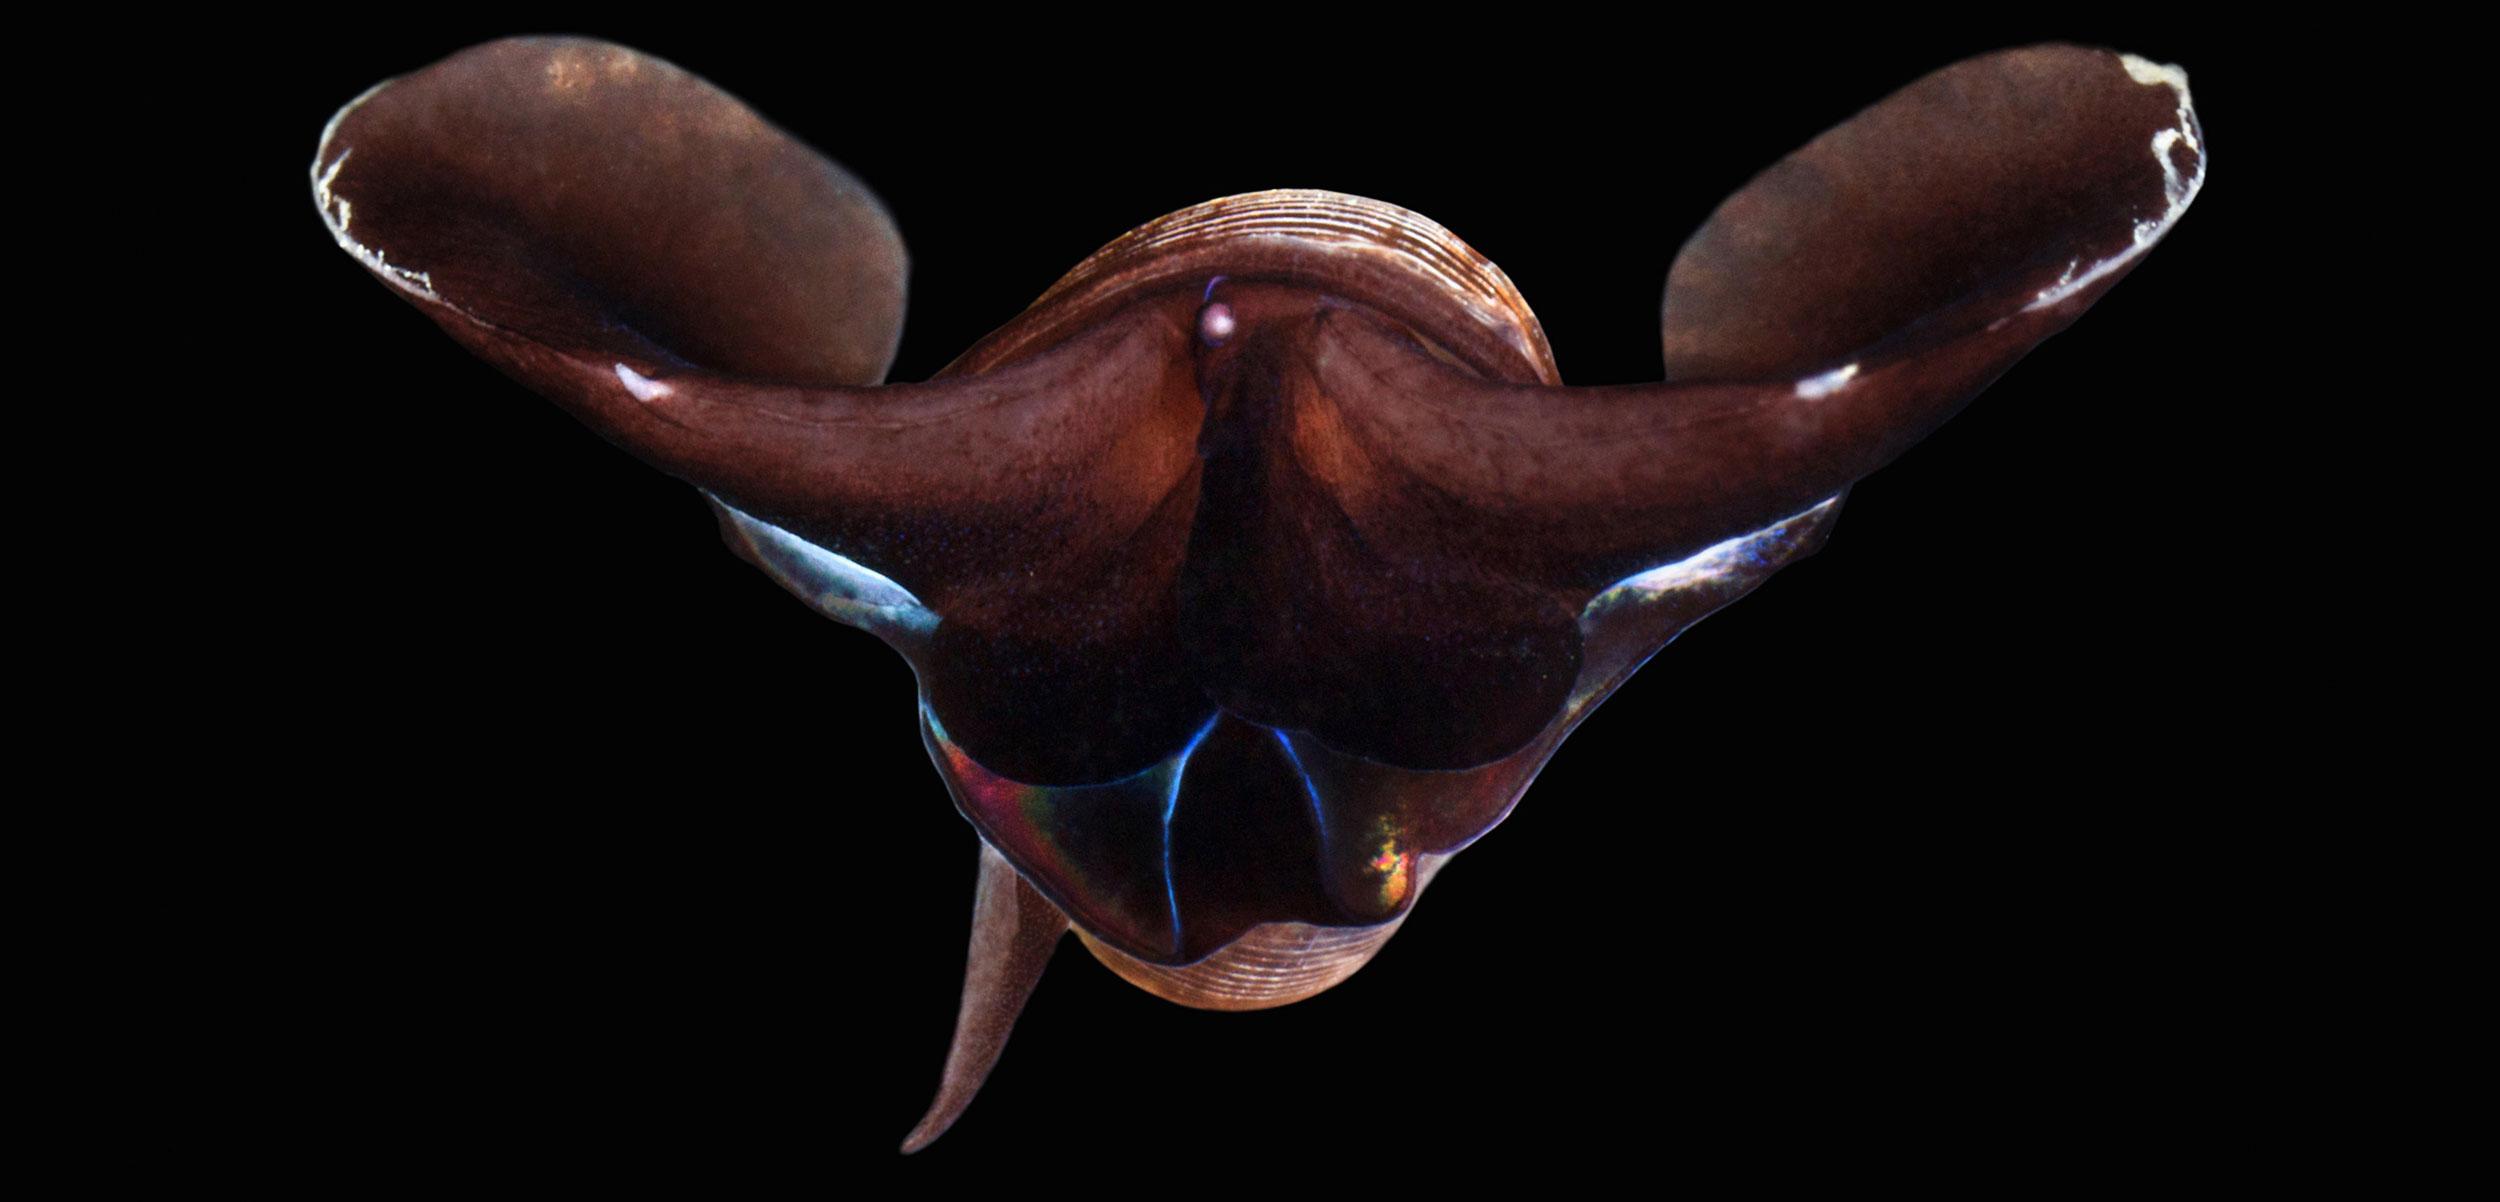 A sea butterfly (Limacina helicina)